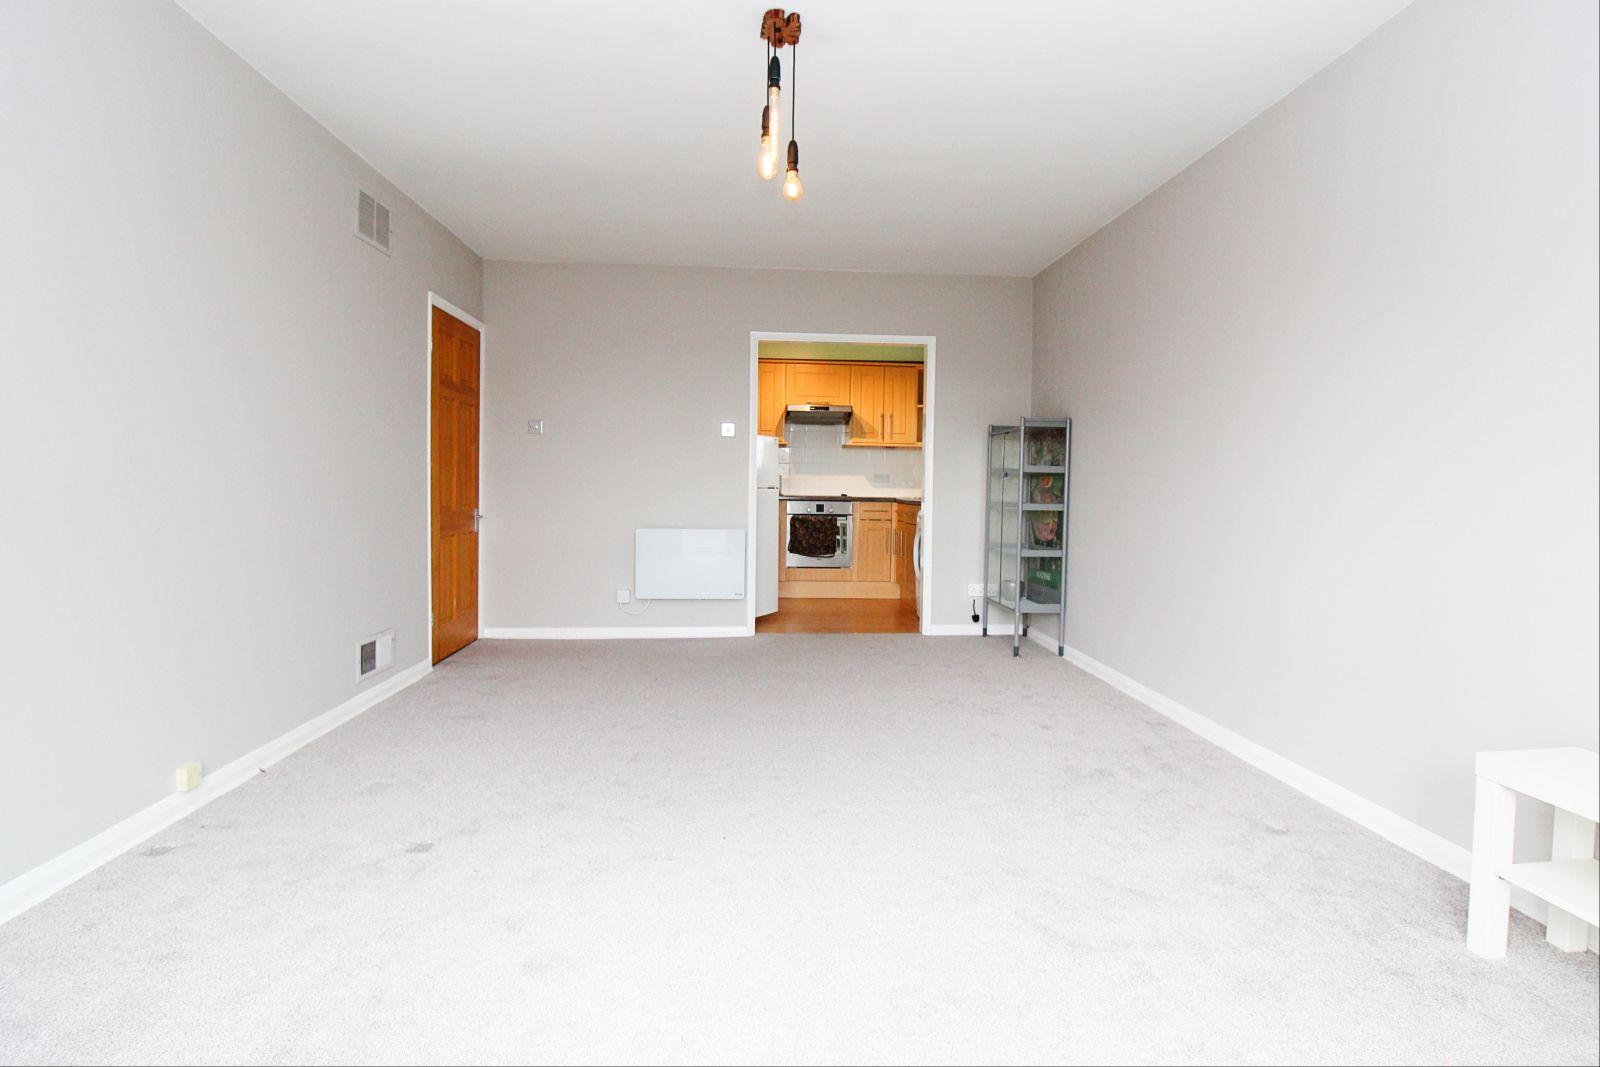 Property photo 1 of 7. 1 Bedroom Flat In Wallington